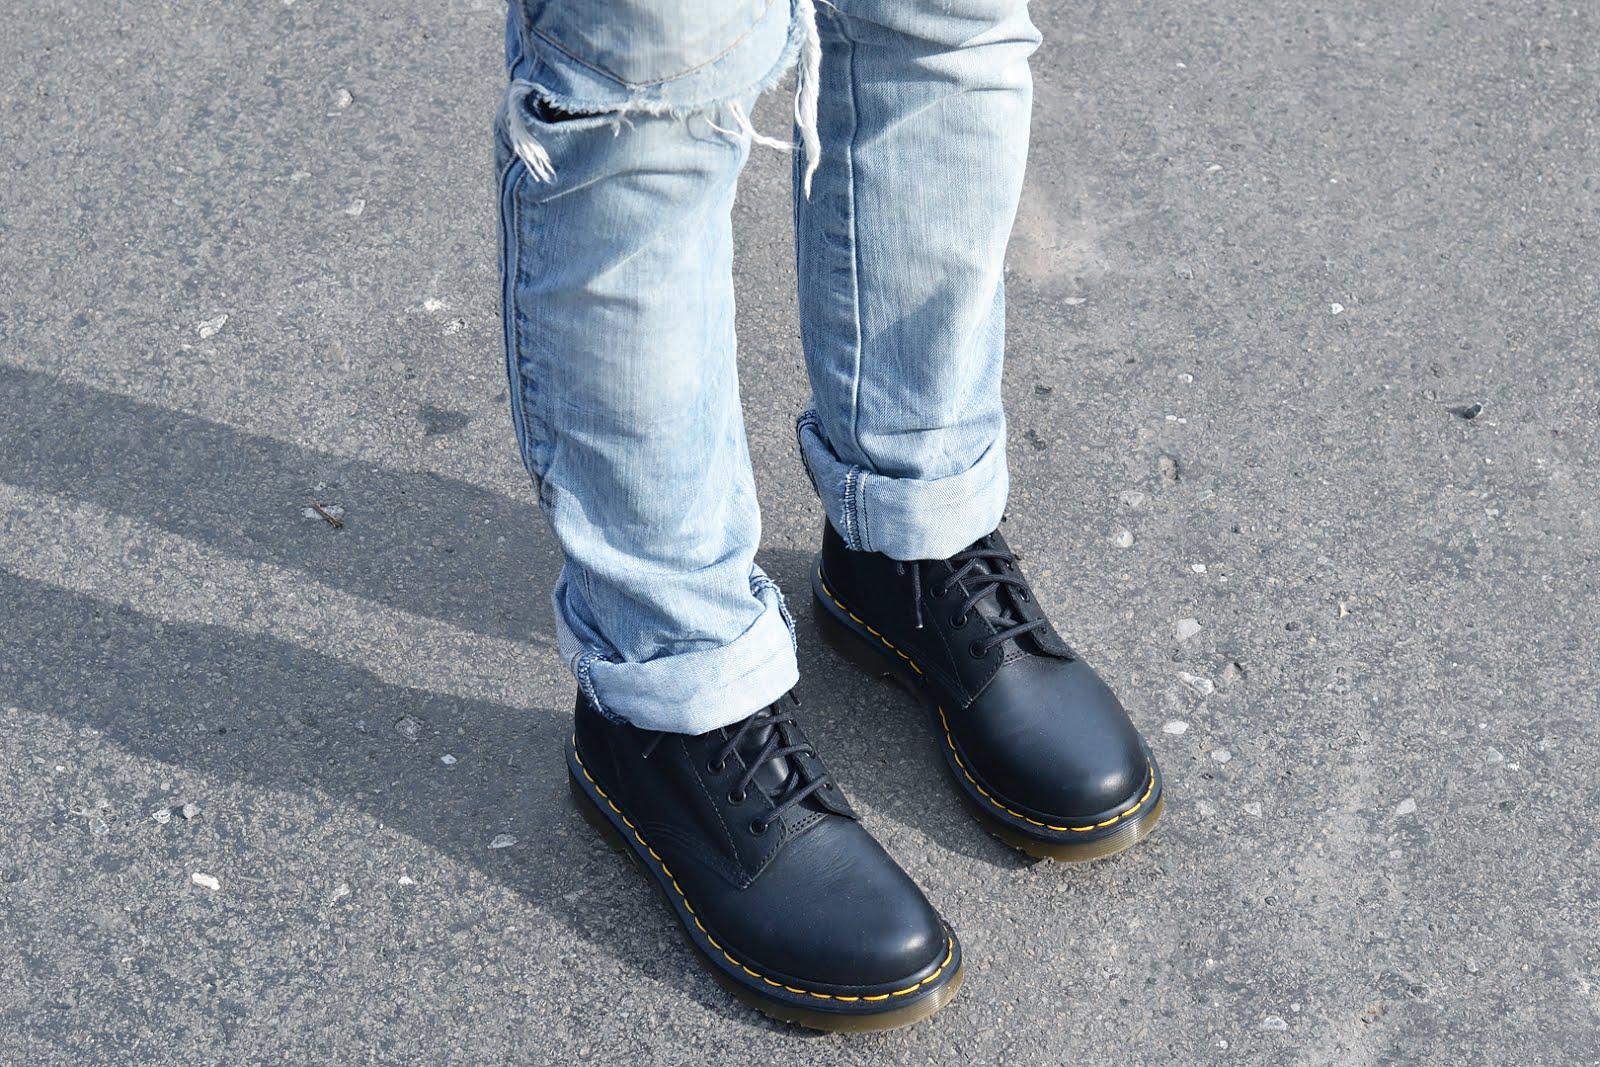 h&m trend jumper, dark green, black biker coat, asos, zara ripped jeans, dr martens boots, virginia, laid back, edgy, outfit, street style, belgian fashion blogger, belgische mode blogger